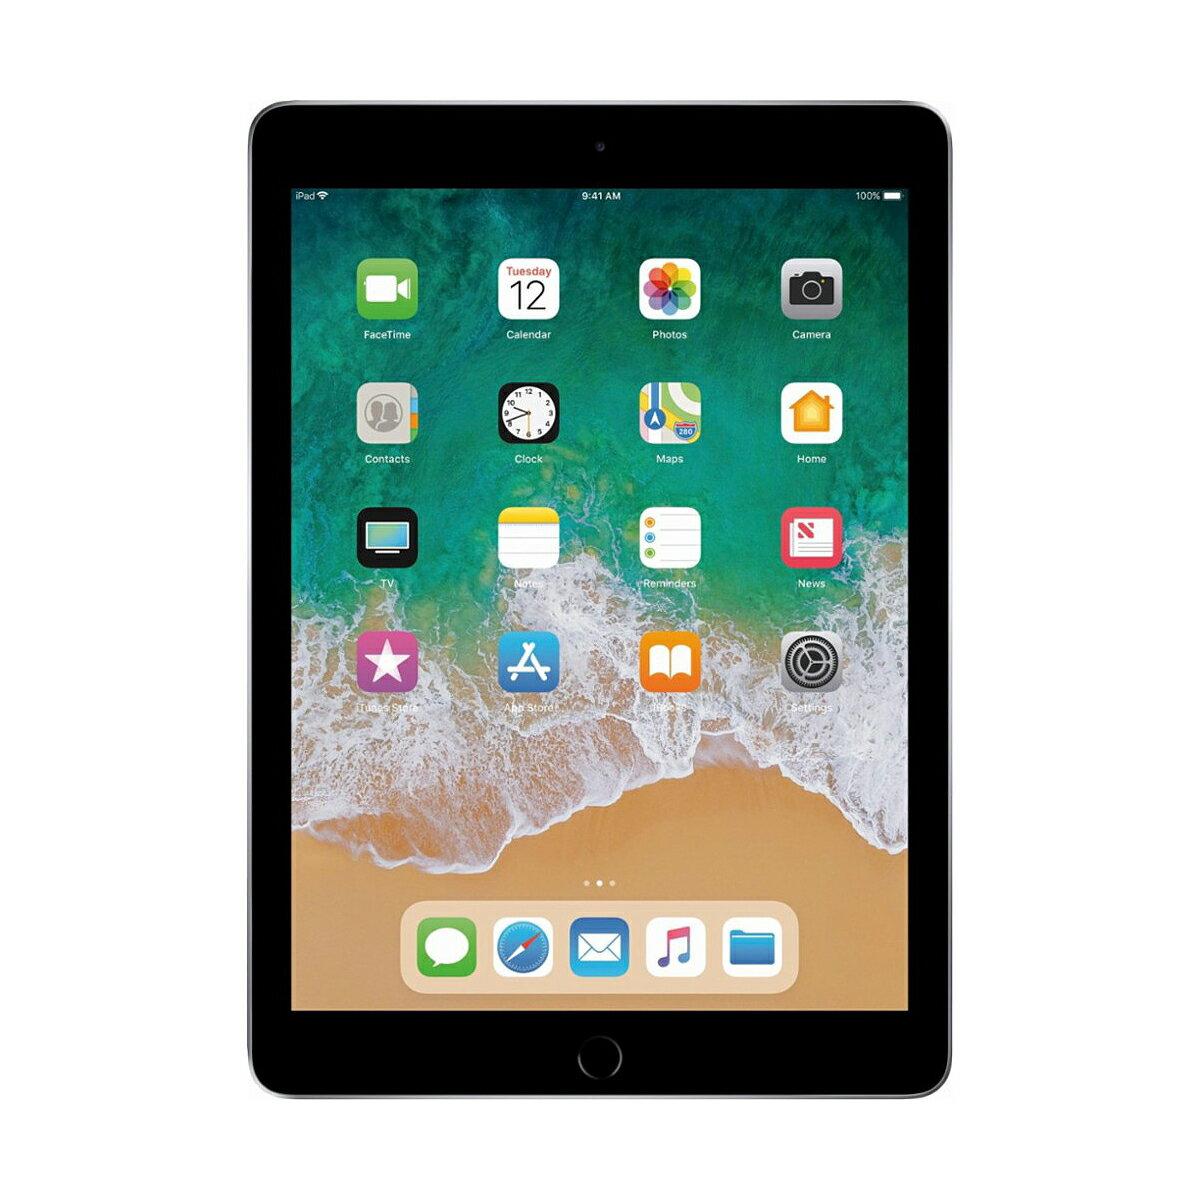 "Apple iPad 9.7"" Retina Display 32GB Wi-Fi Multi-Touch Tablet 5th Gen MP2F2LLA - Space Gray 1"